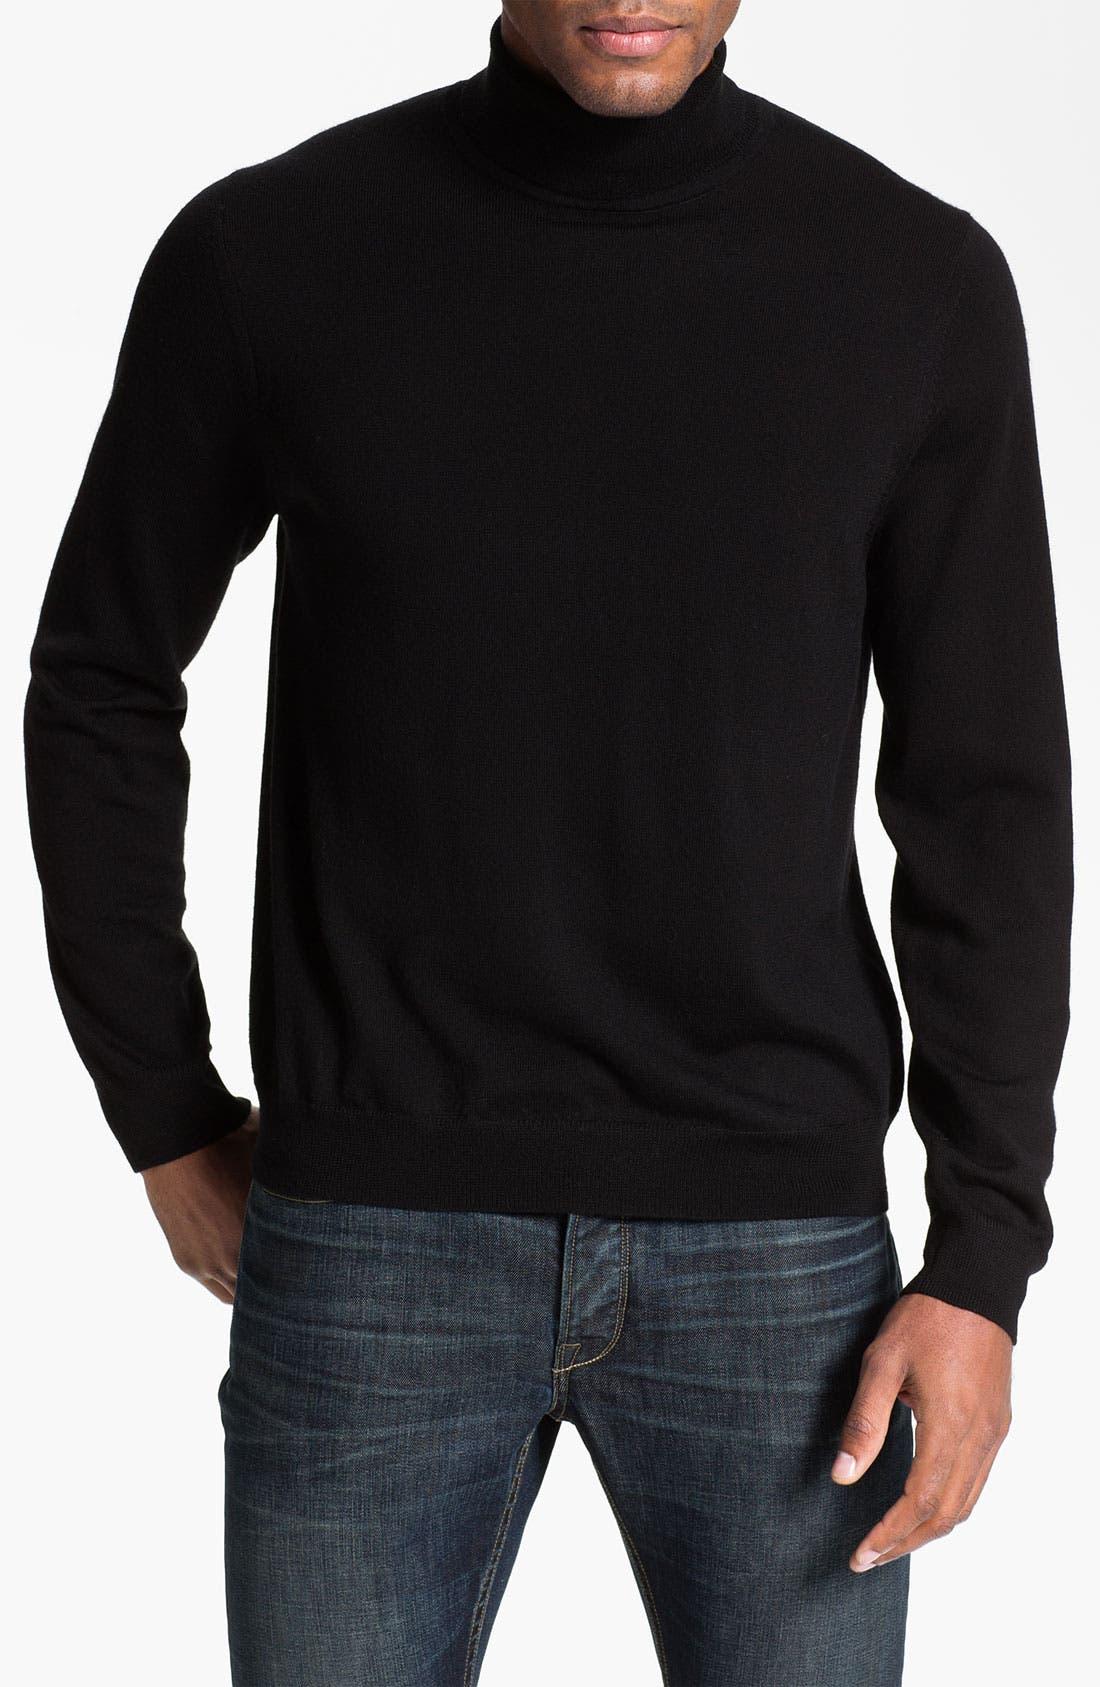 Main Image - Nordstrom Merino Wool Turtleneck